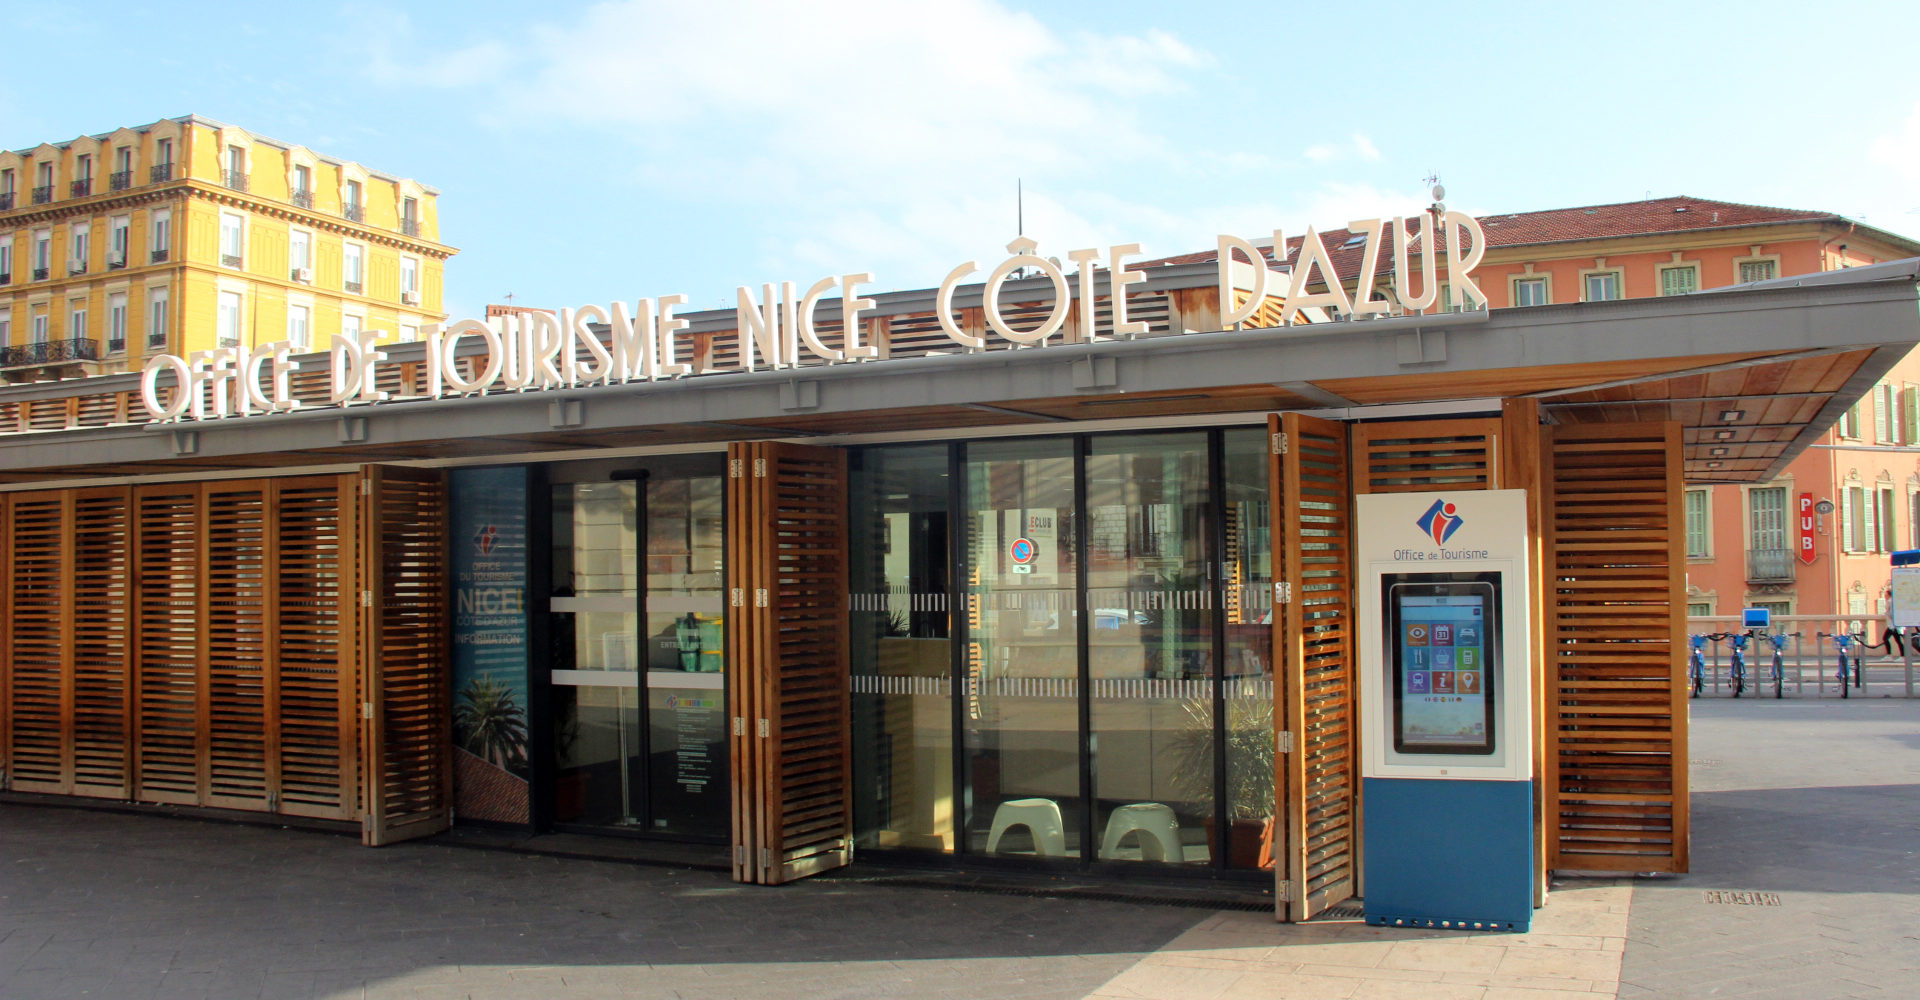 Borne- Totem -Office de Tourisme de tourisme